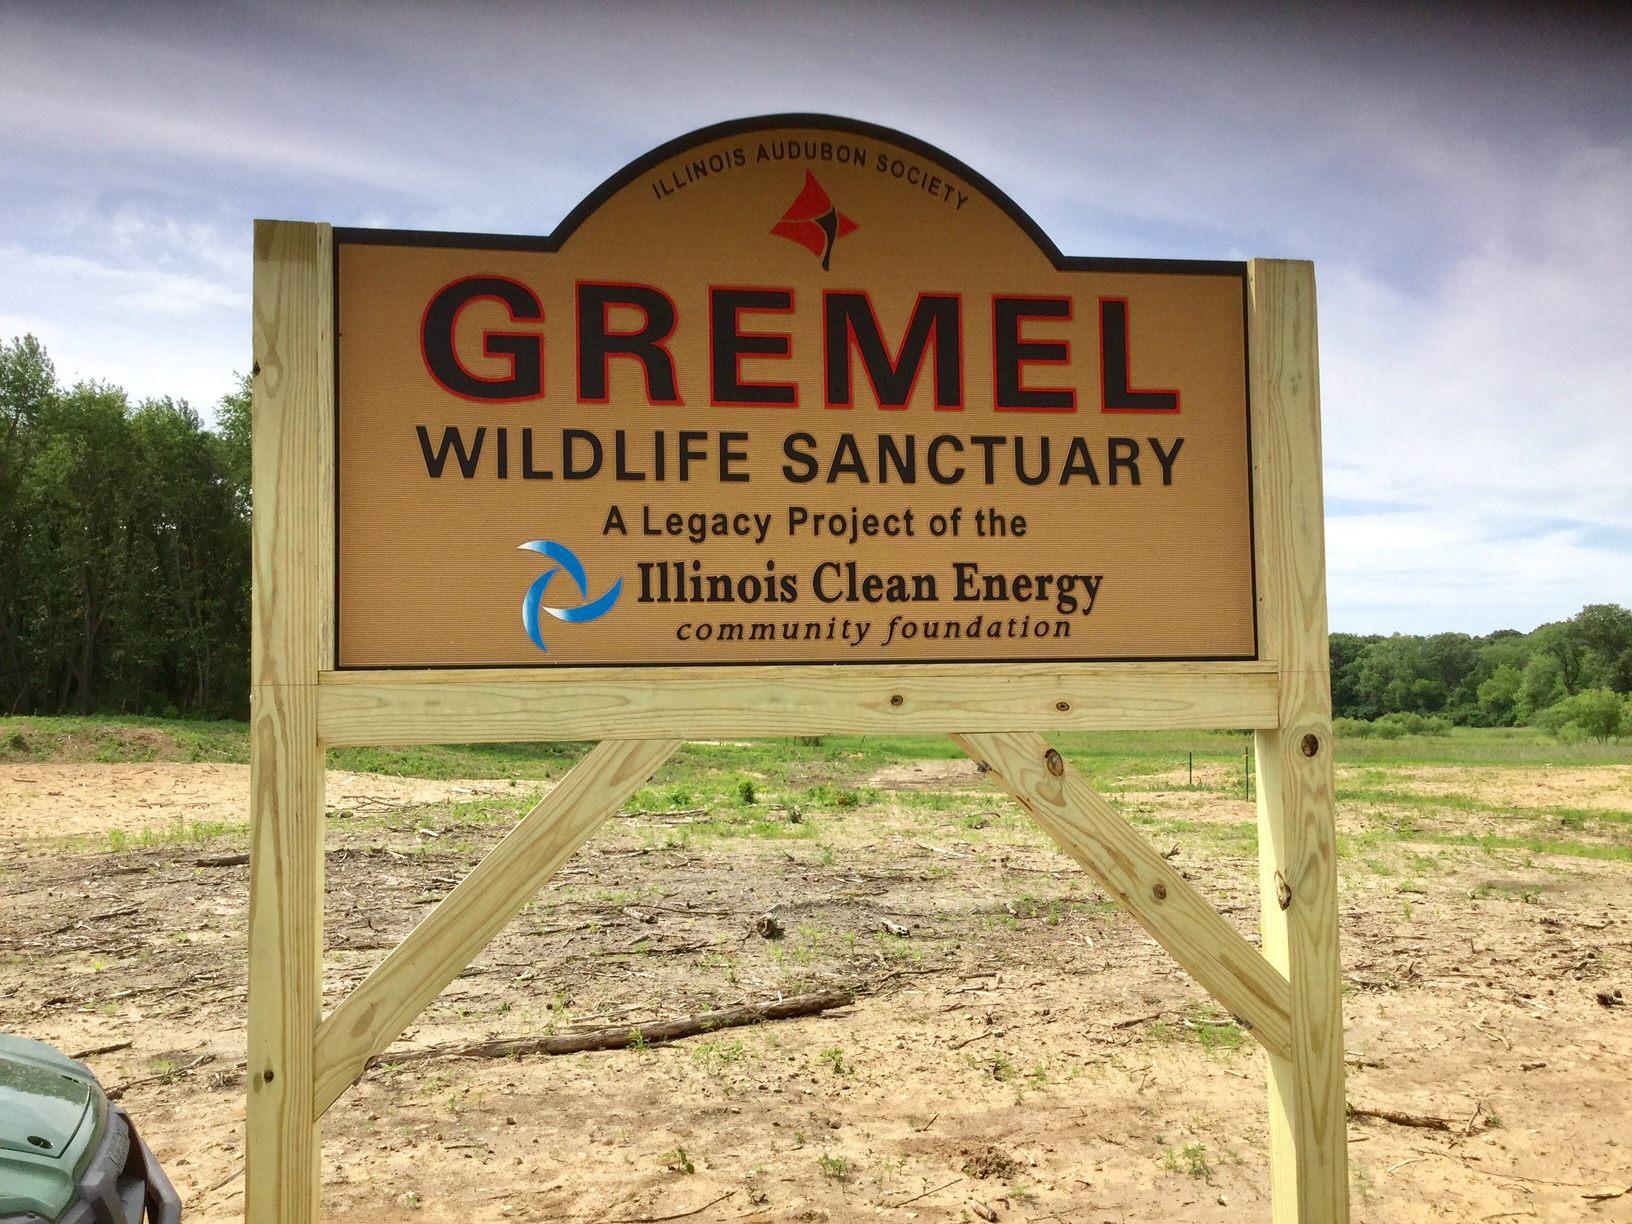 Gremel Wildlife Sanctuary